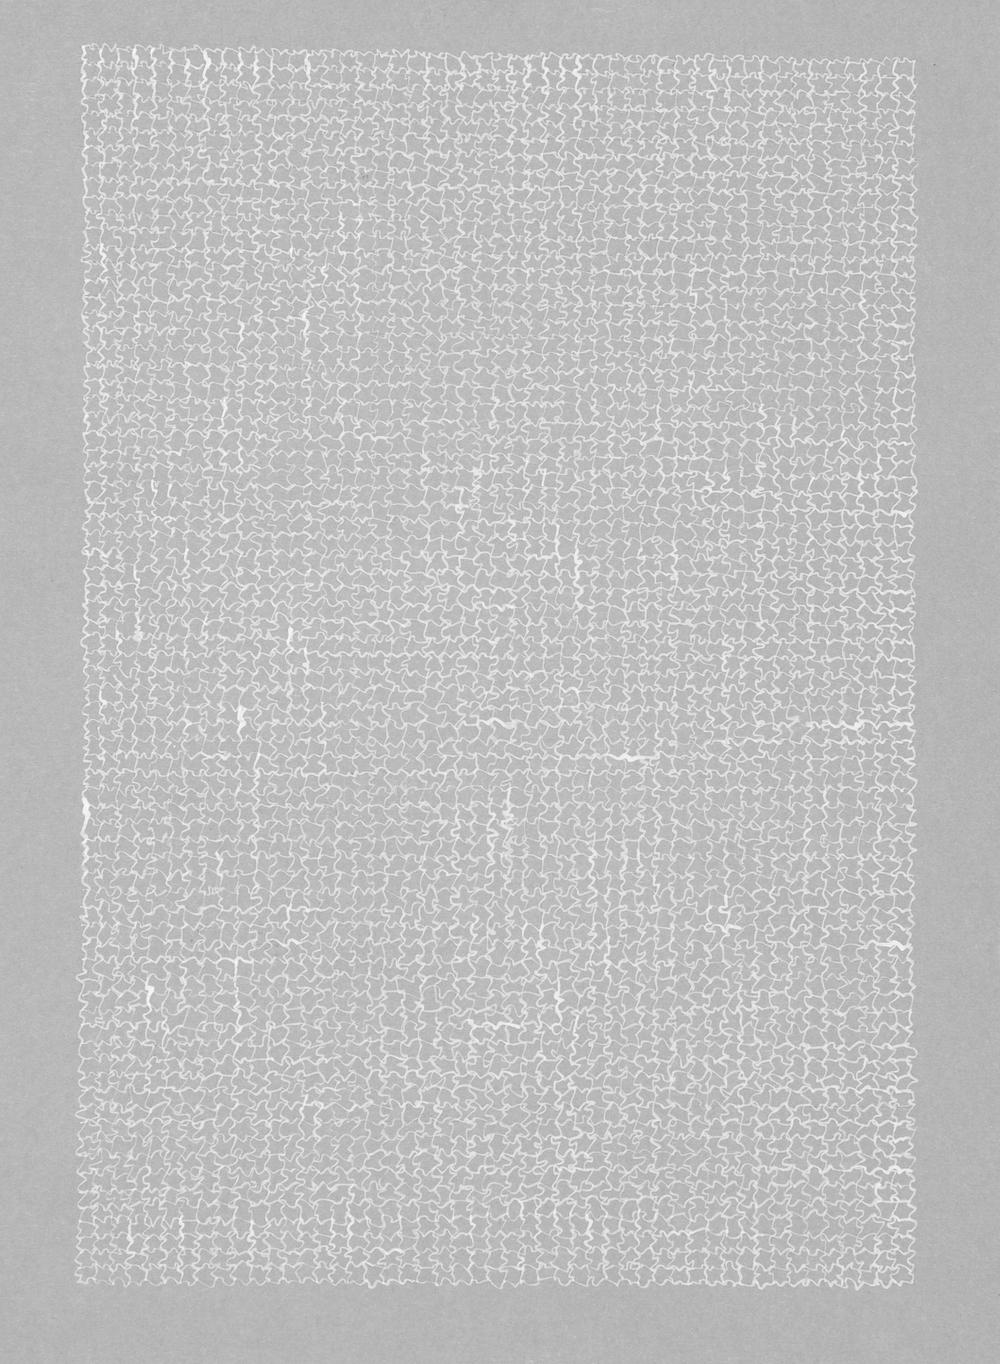 Untitled Grey , 2013 / Ink on paper / 30cm x 20cm